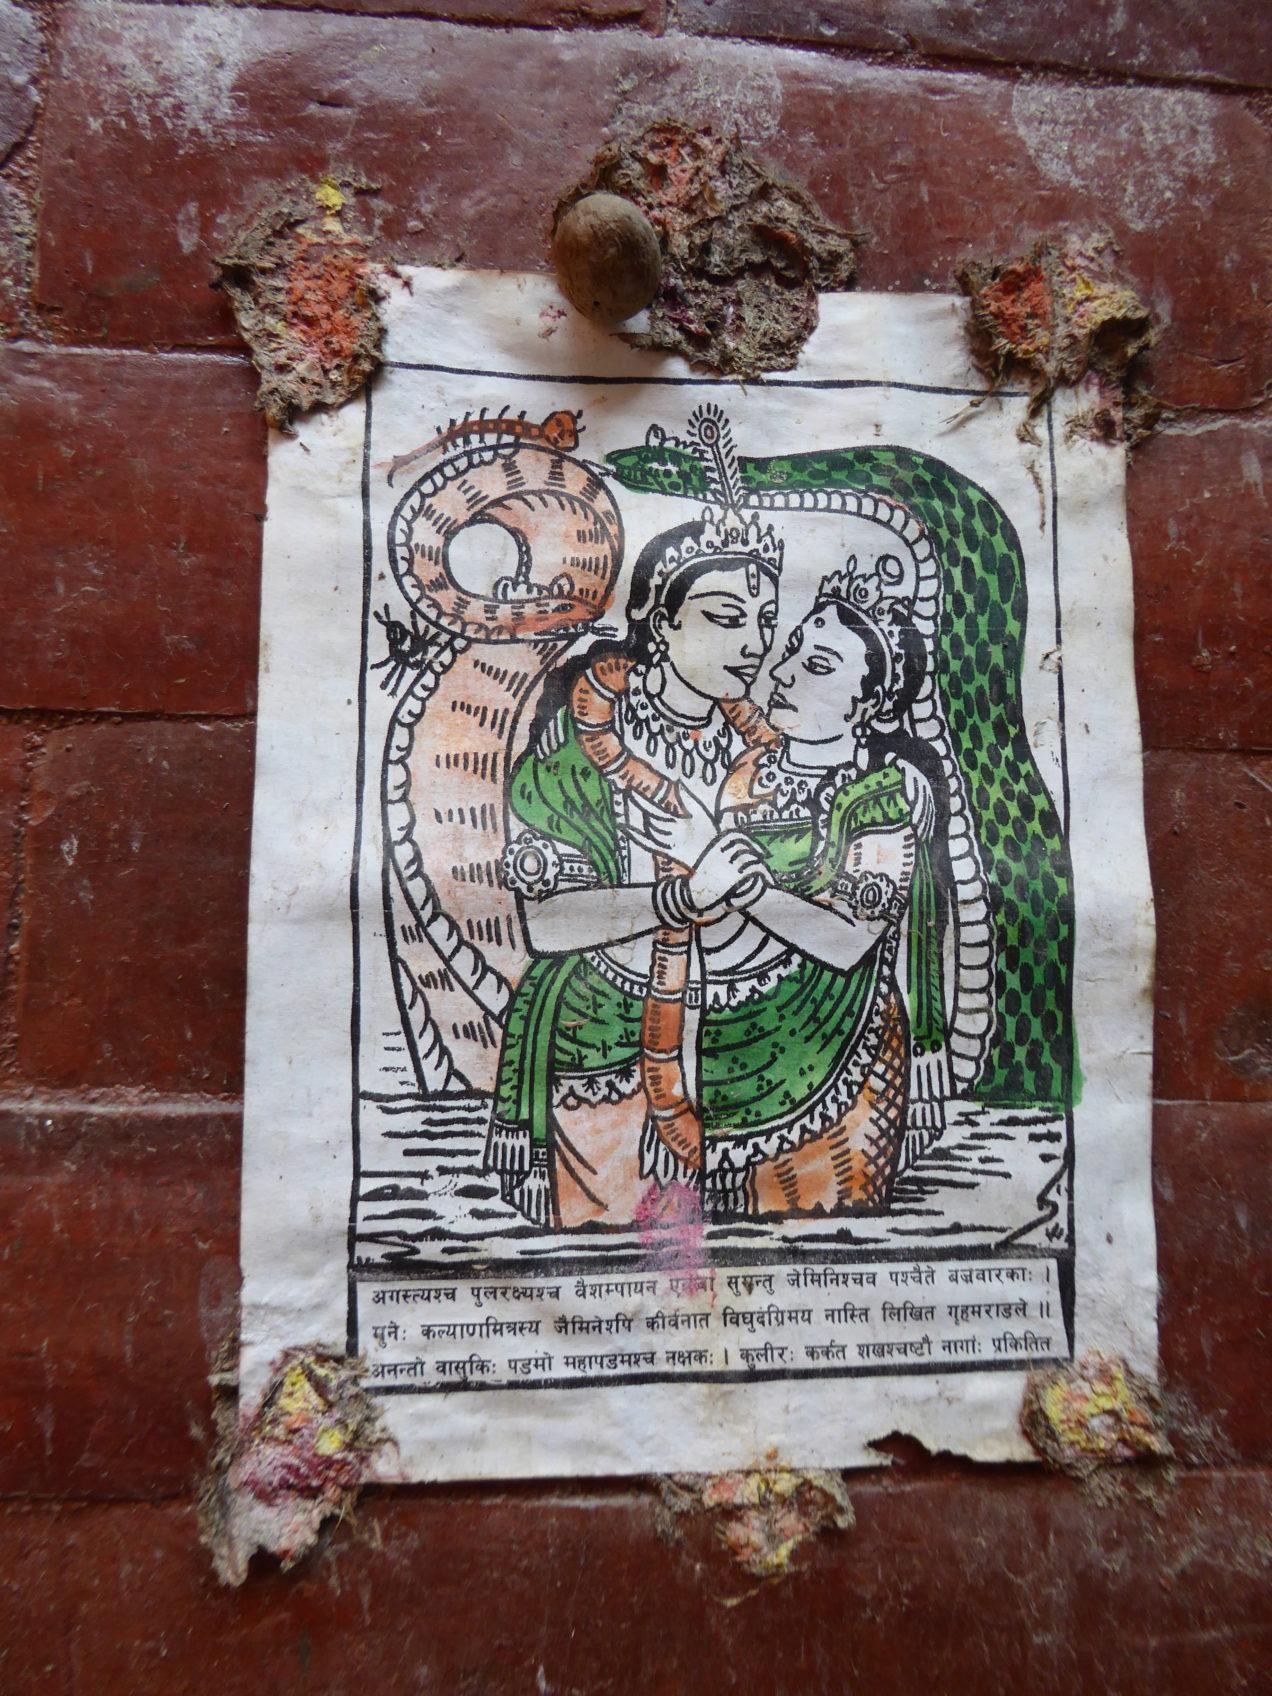 Hindu religious poster by Rupert Wolfe Murray in Kathmandu